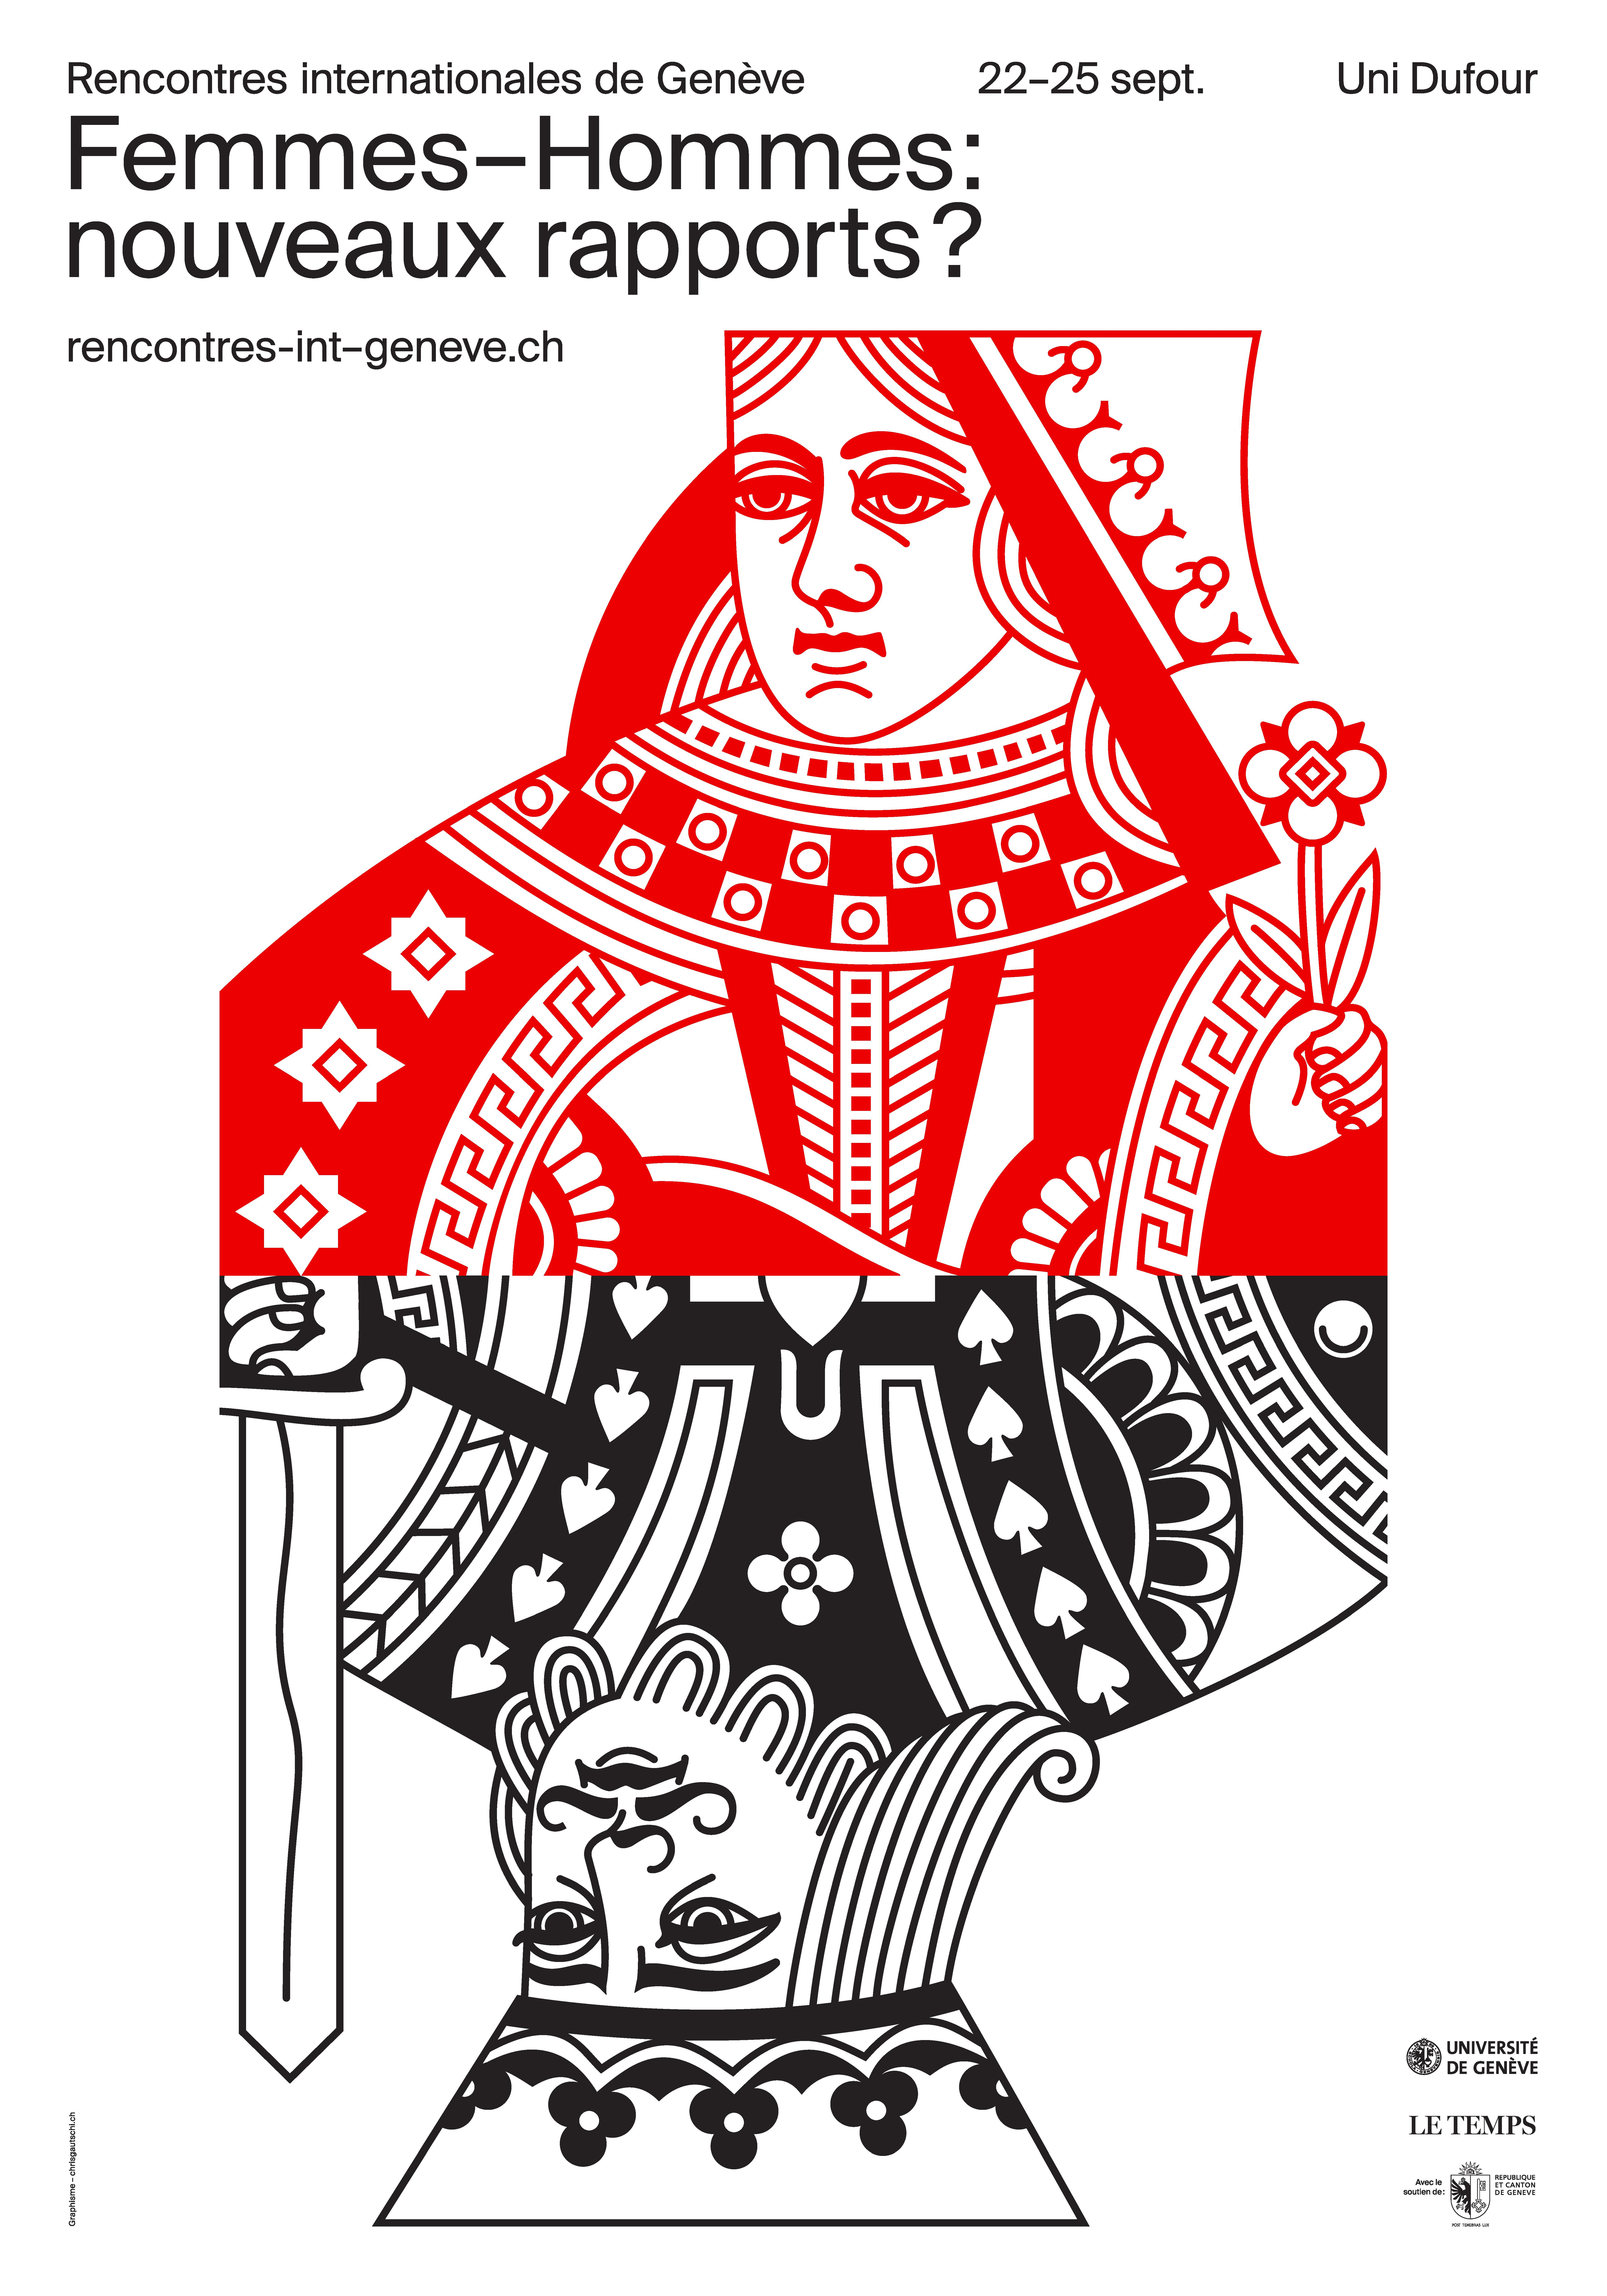 RIG-affiche-2020-rapports-femmes-hommes-Chris-Gautschi